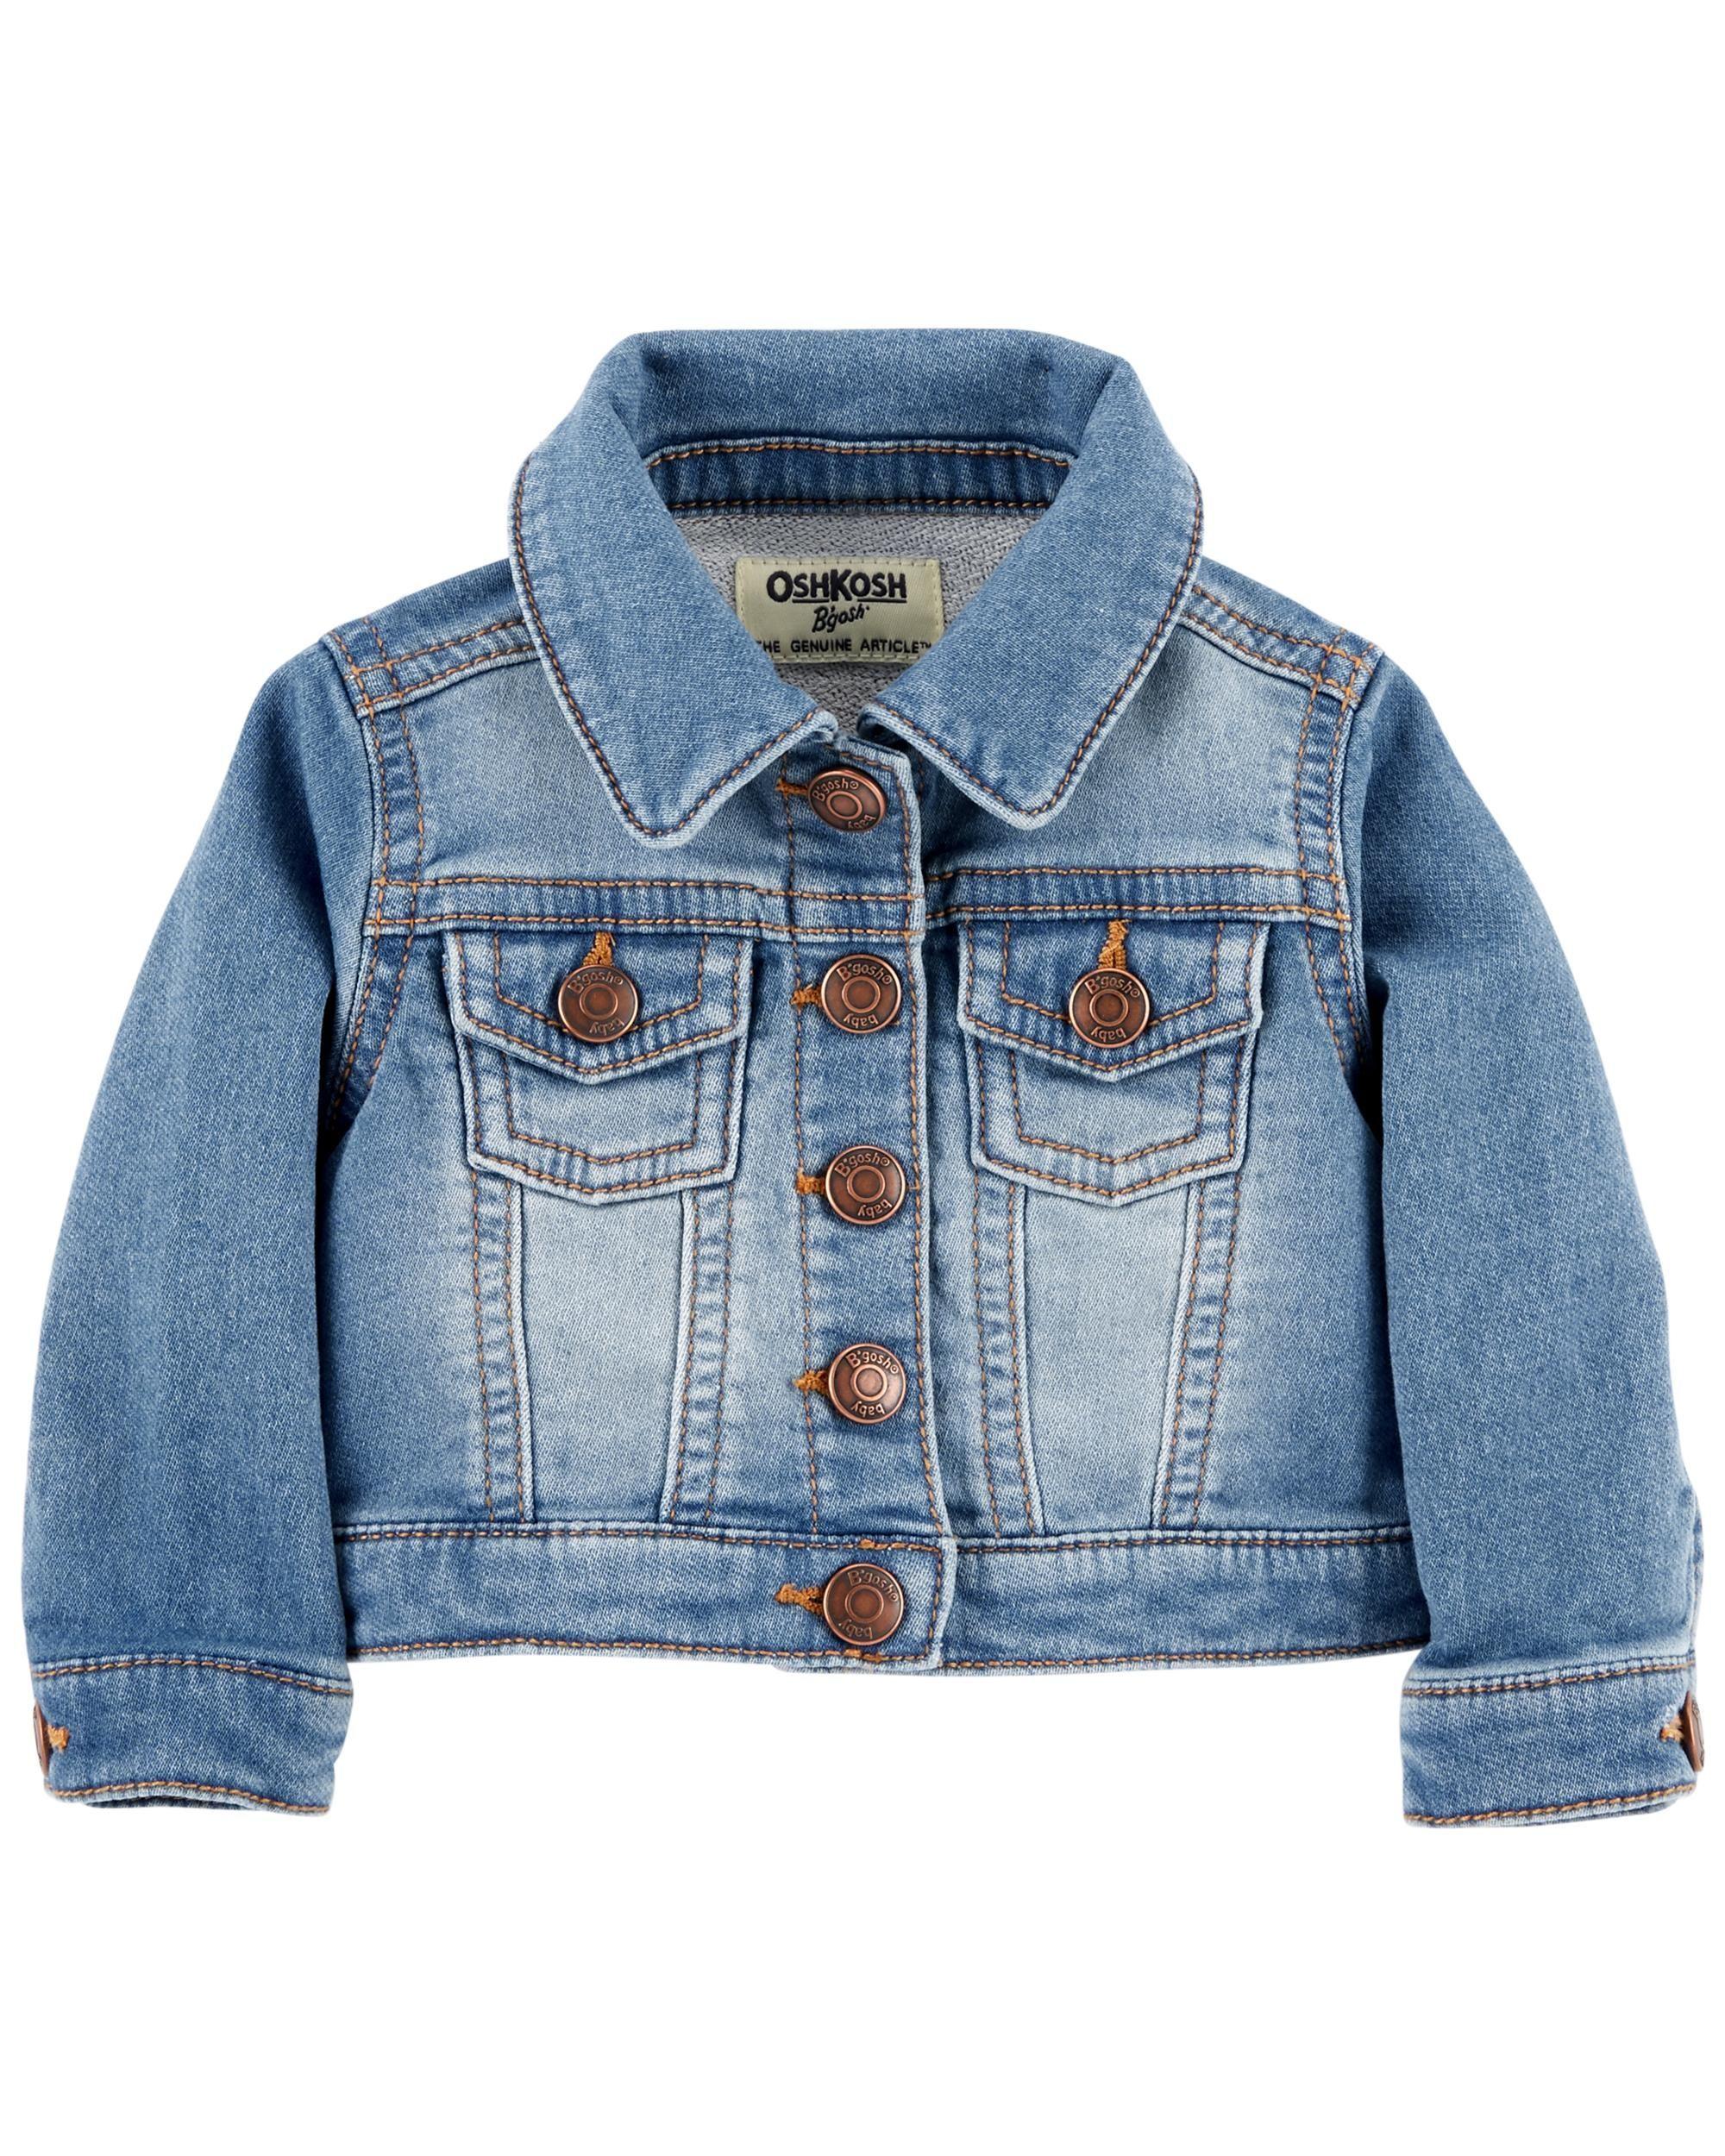 Classic Denim Jacket Boy Outerwear Carters Baby Clothes Denim Jacket [ 2500 x 2000 Pixel ]